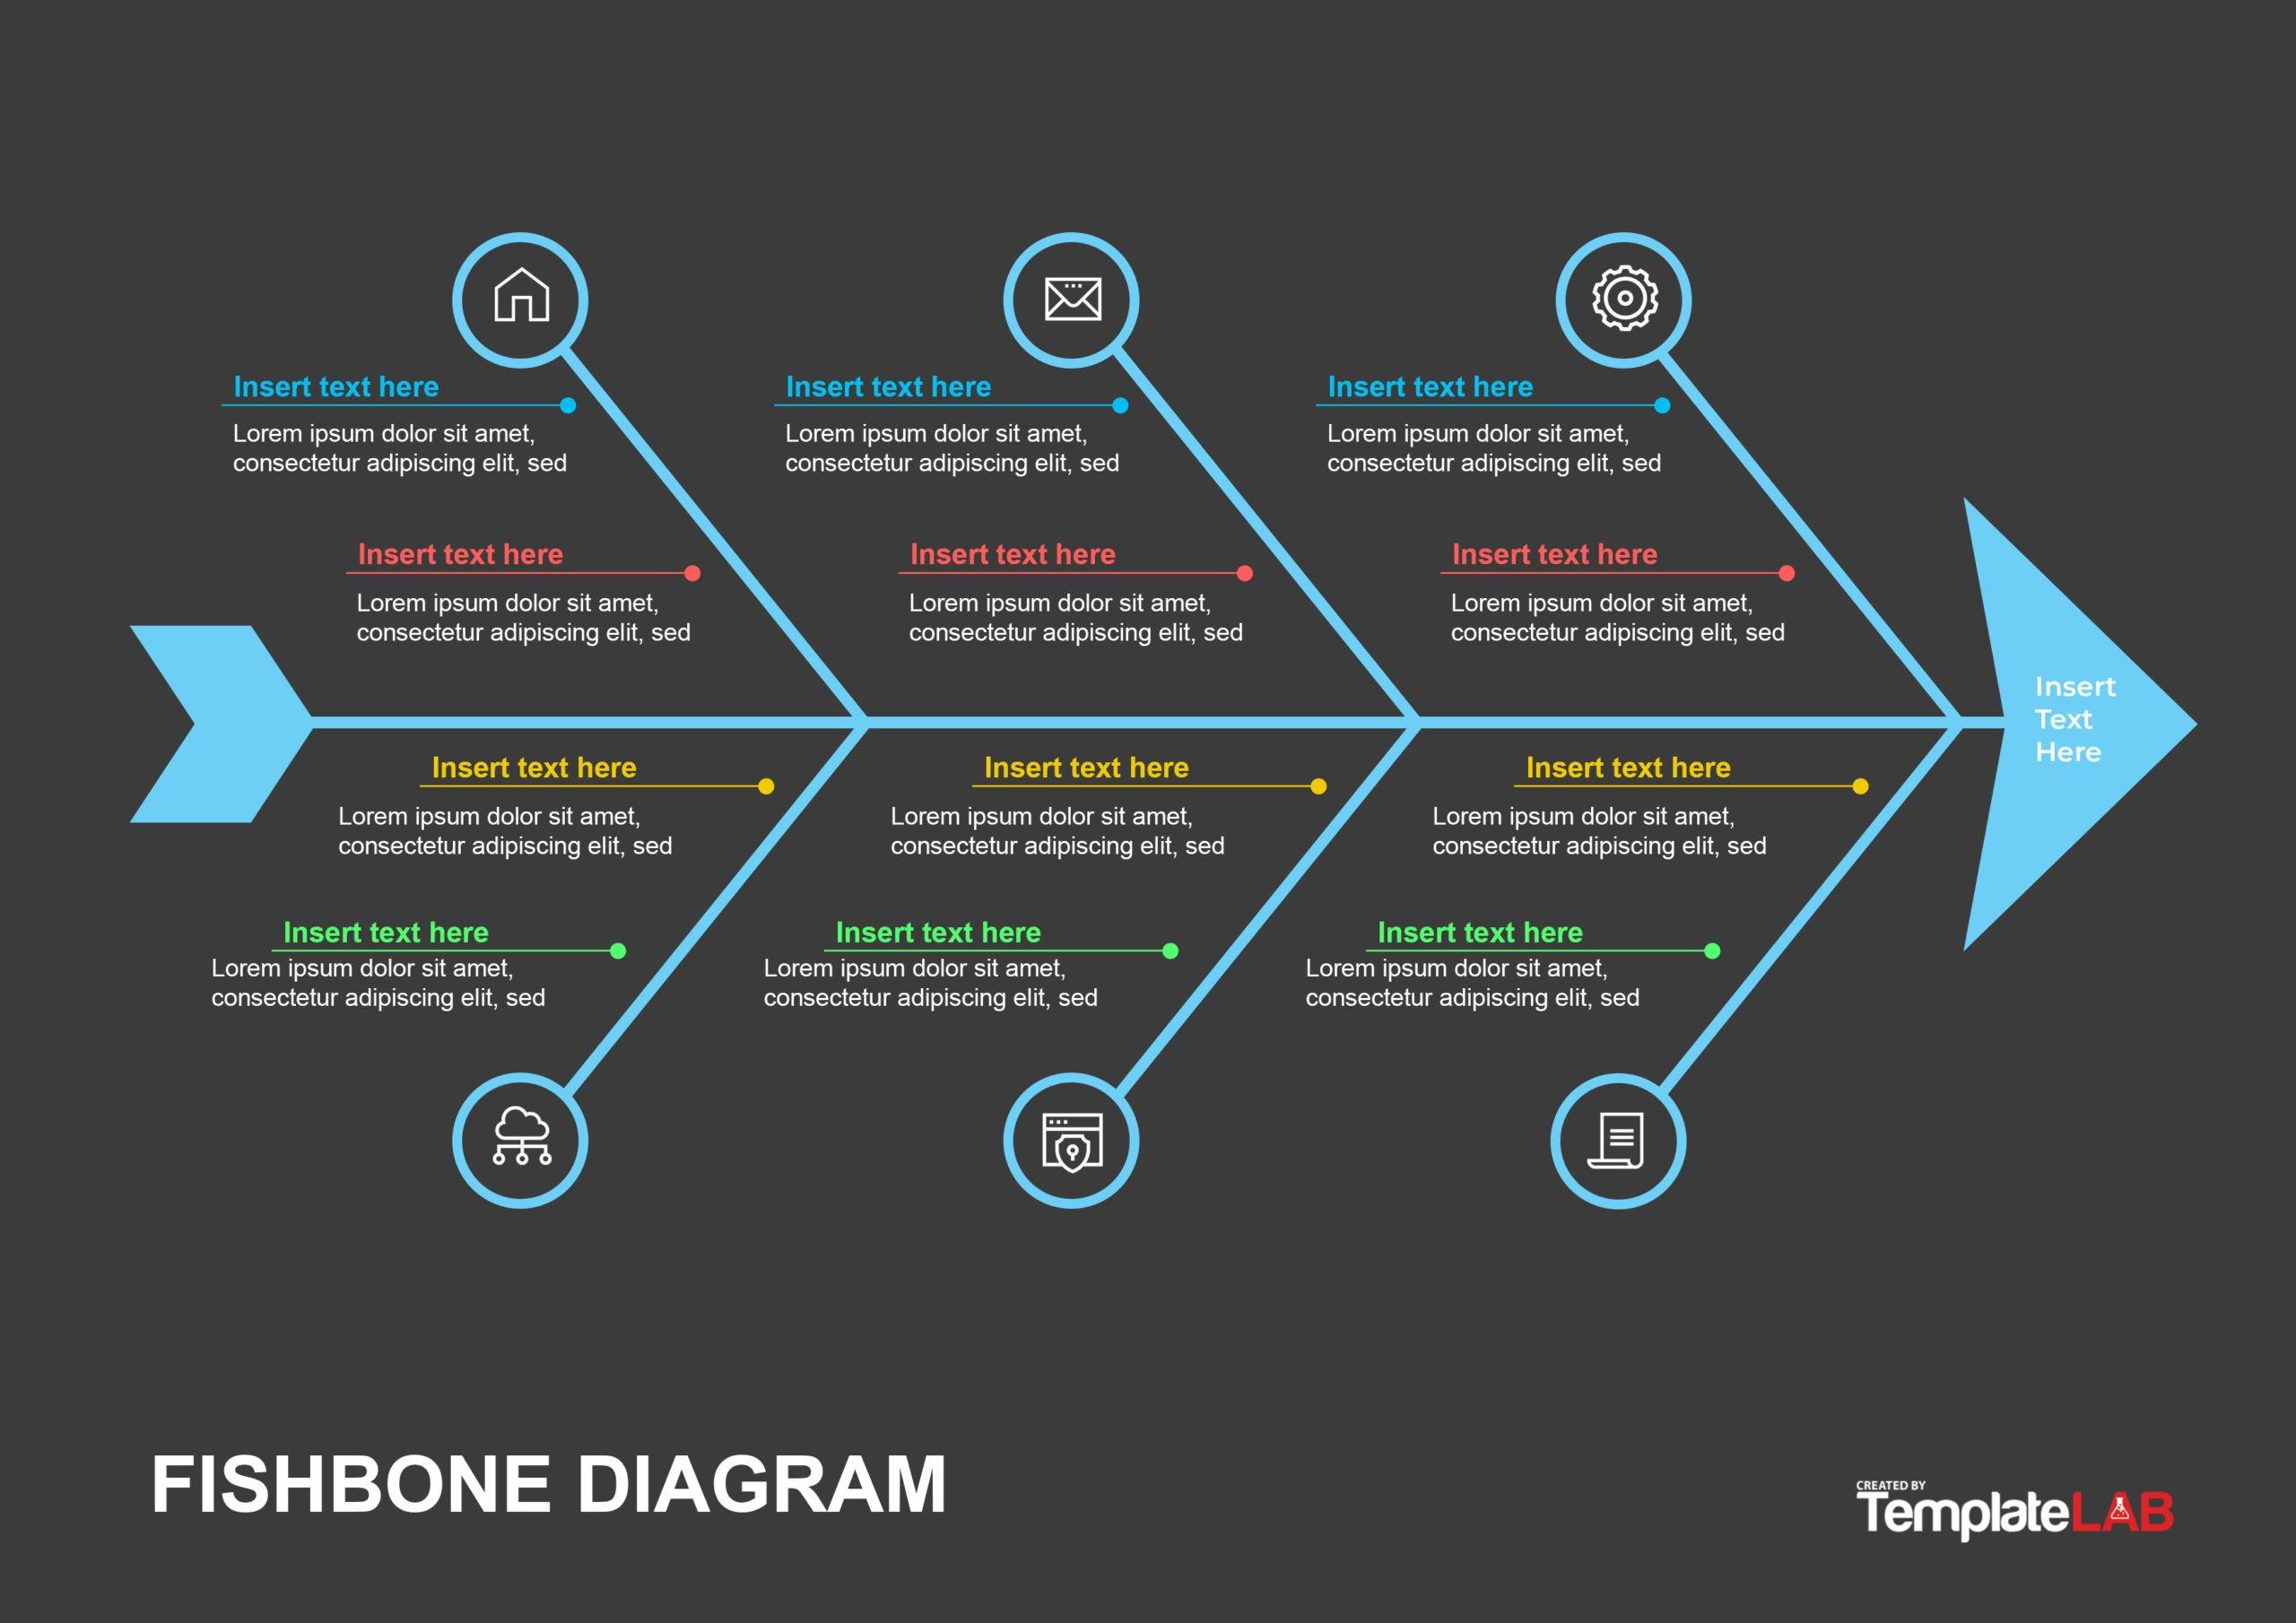 Free Fishbone Diagram Template 09 - TemplateLab.com